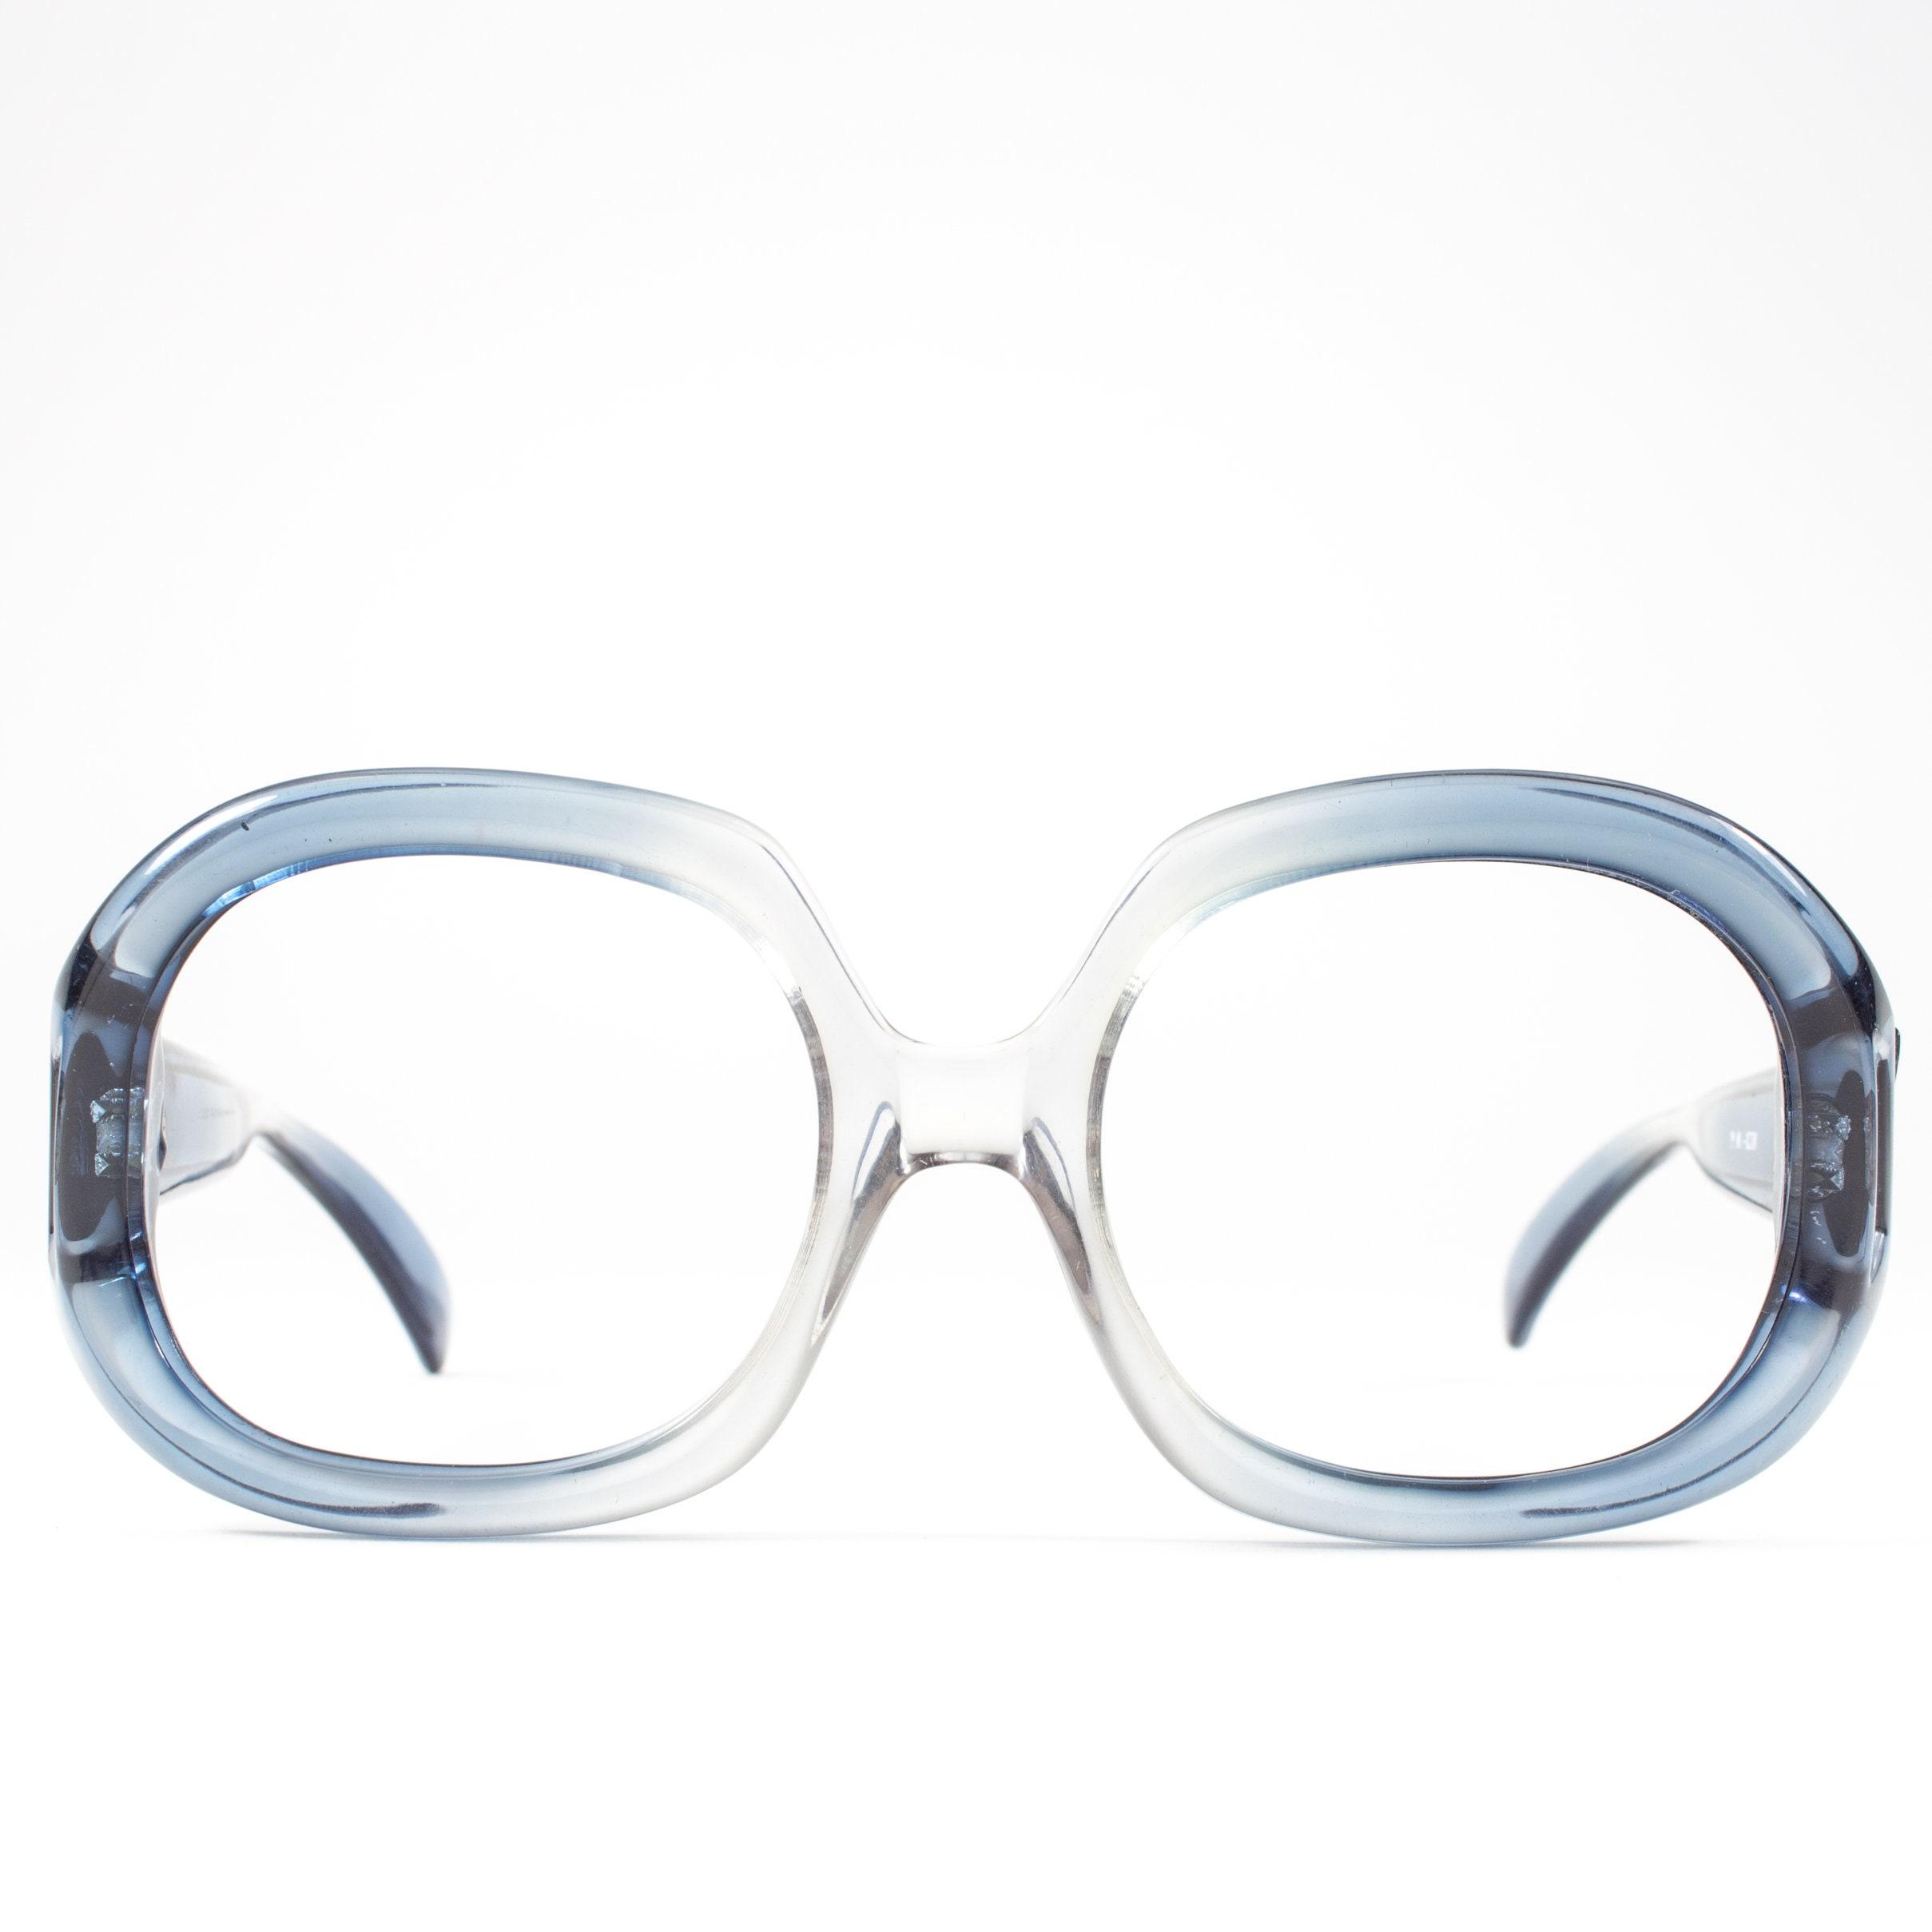 6b87dc38c7 Vintage 1970s Eyeglass Frame